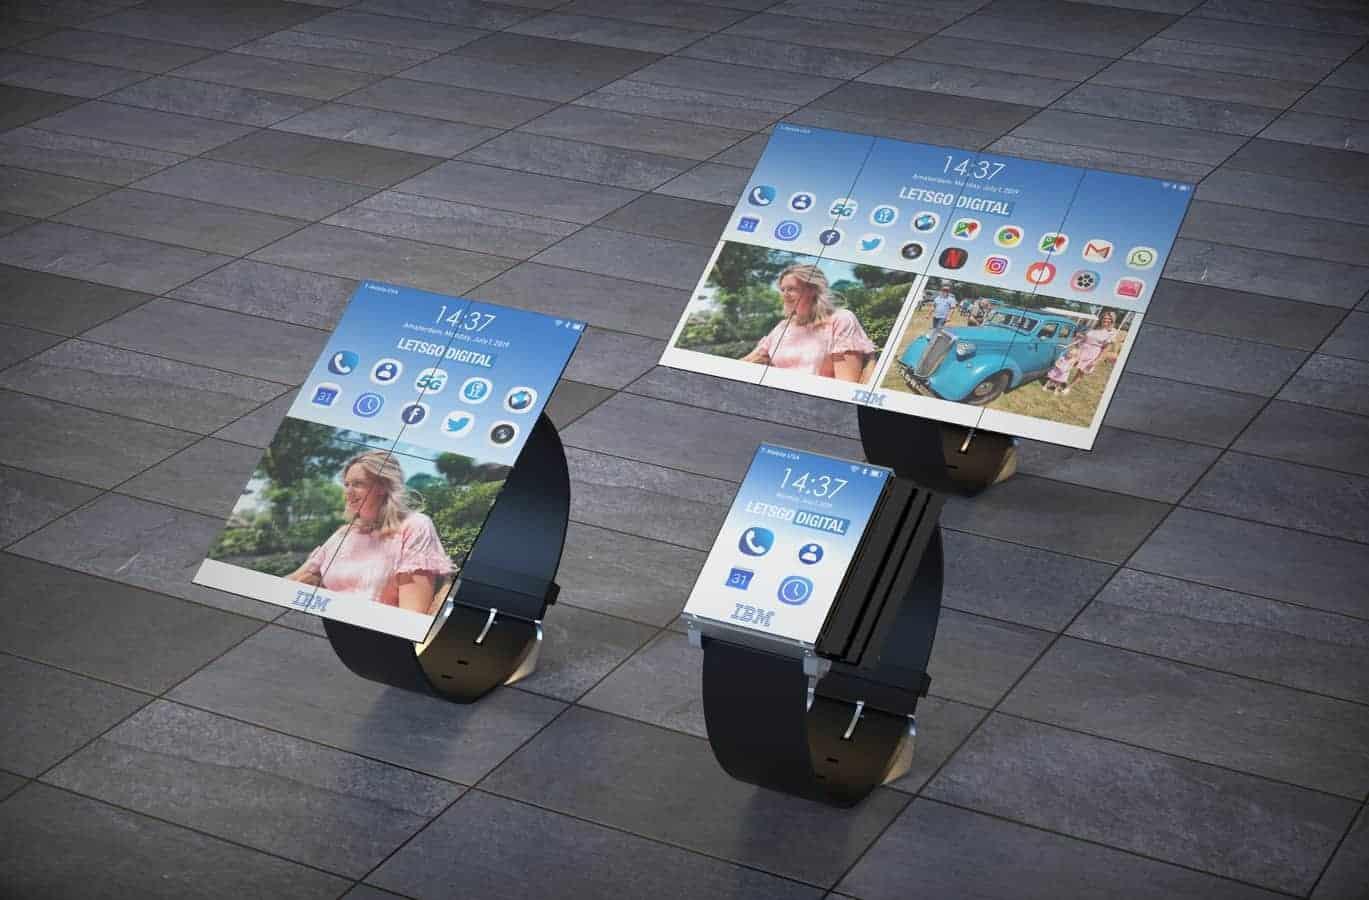 IBM smartwatch patent 5